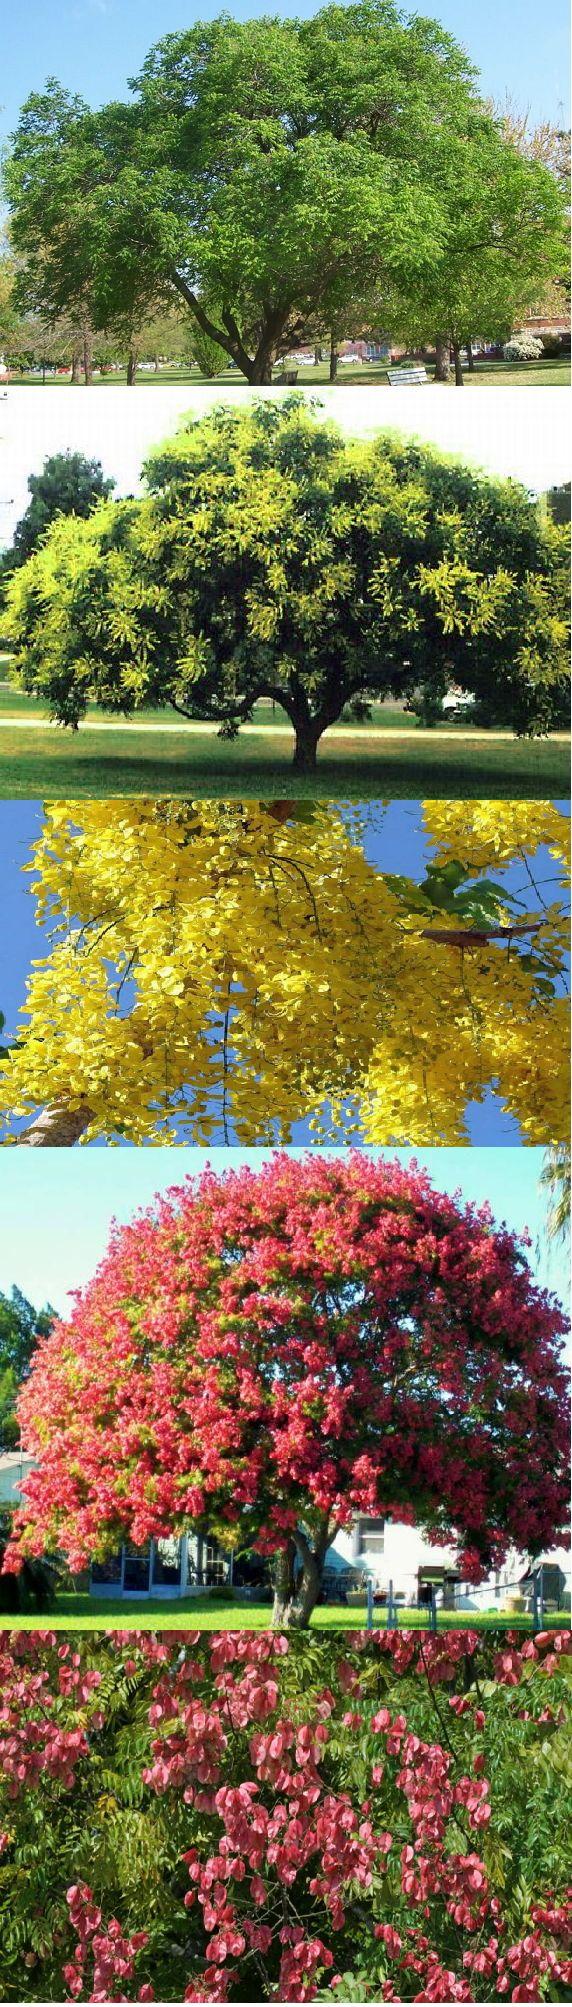 Small ornamental trees zone 6 - Golden Rain Tree Koelreuteria Paniculata Zone 5 9b Full Sun 30